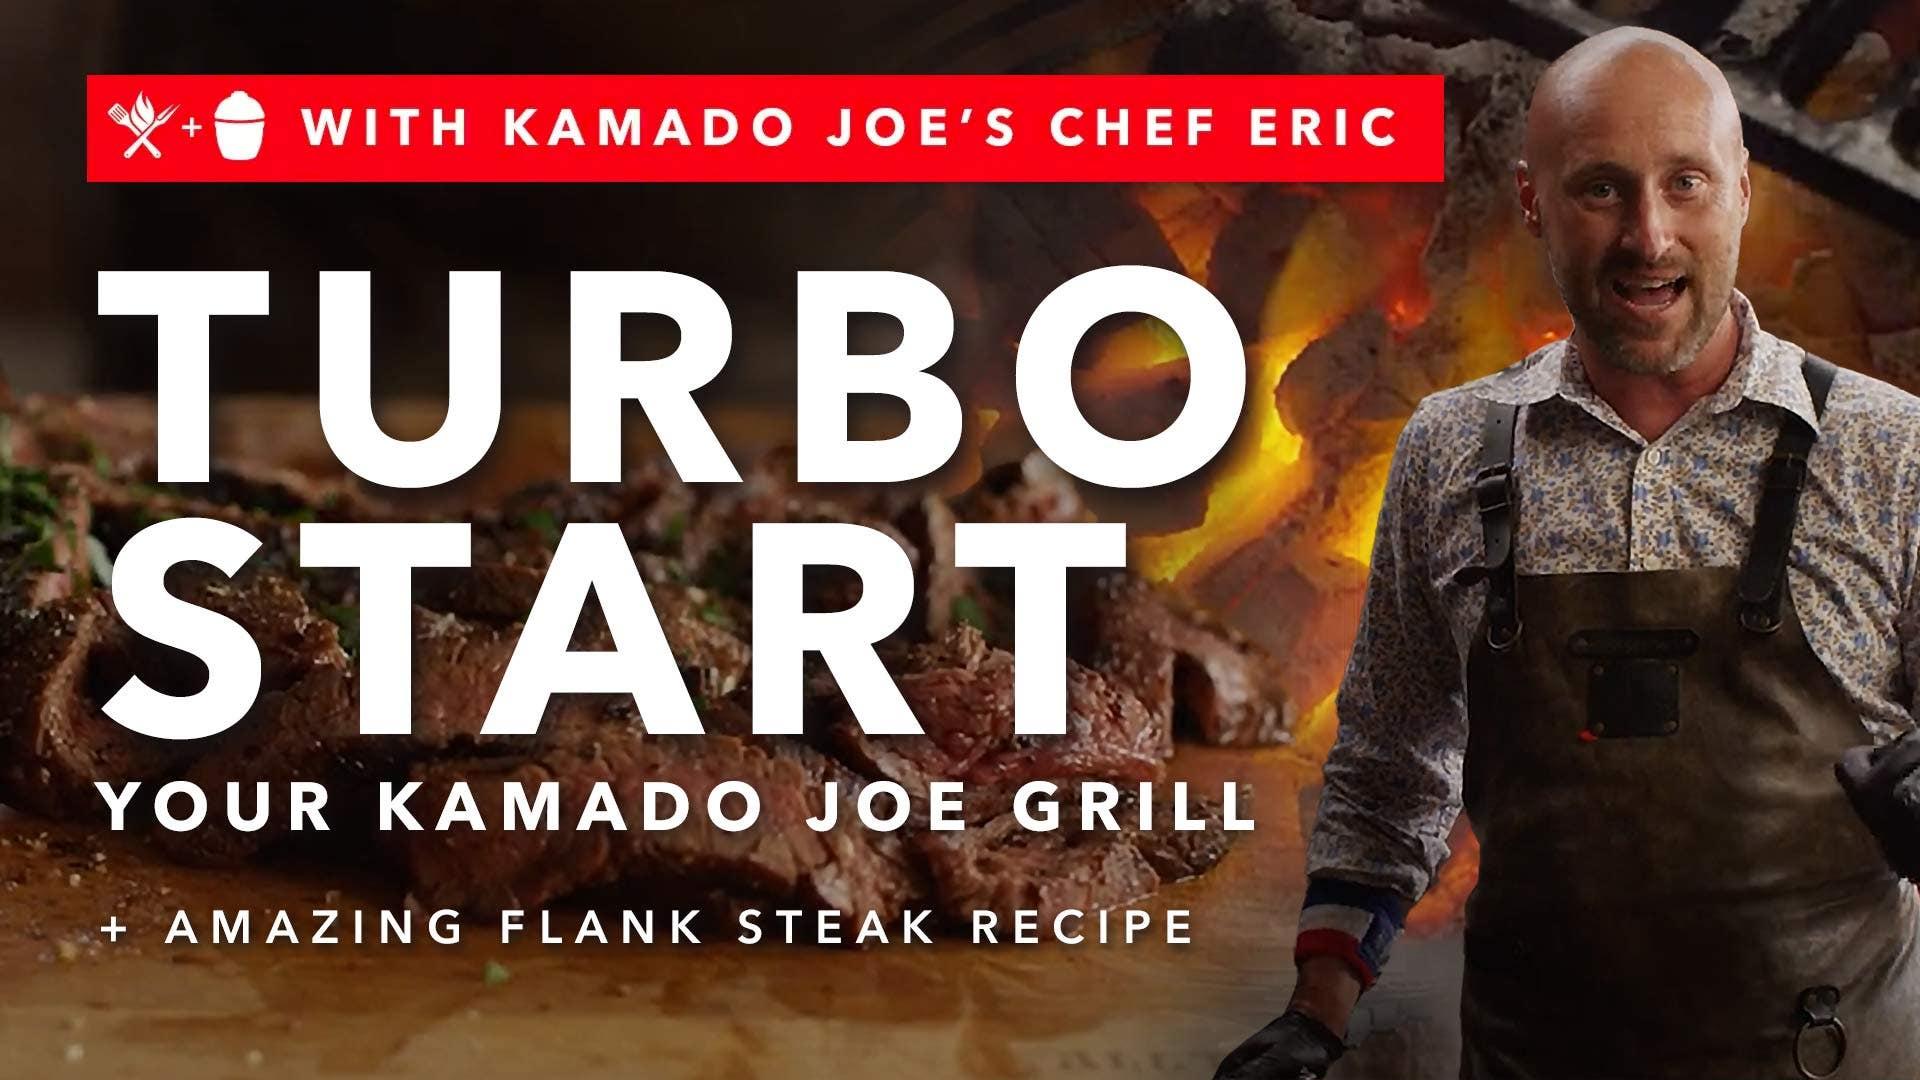 Turbo Start Your Kamado Joe Grill